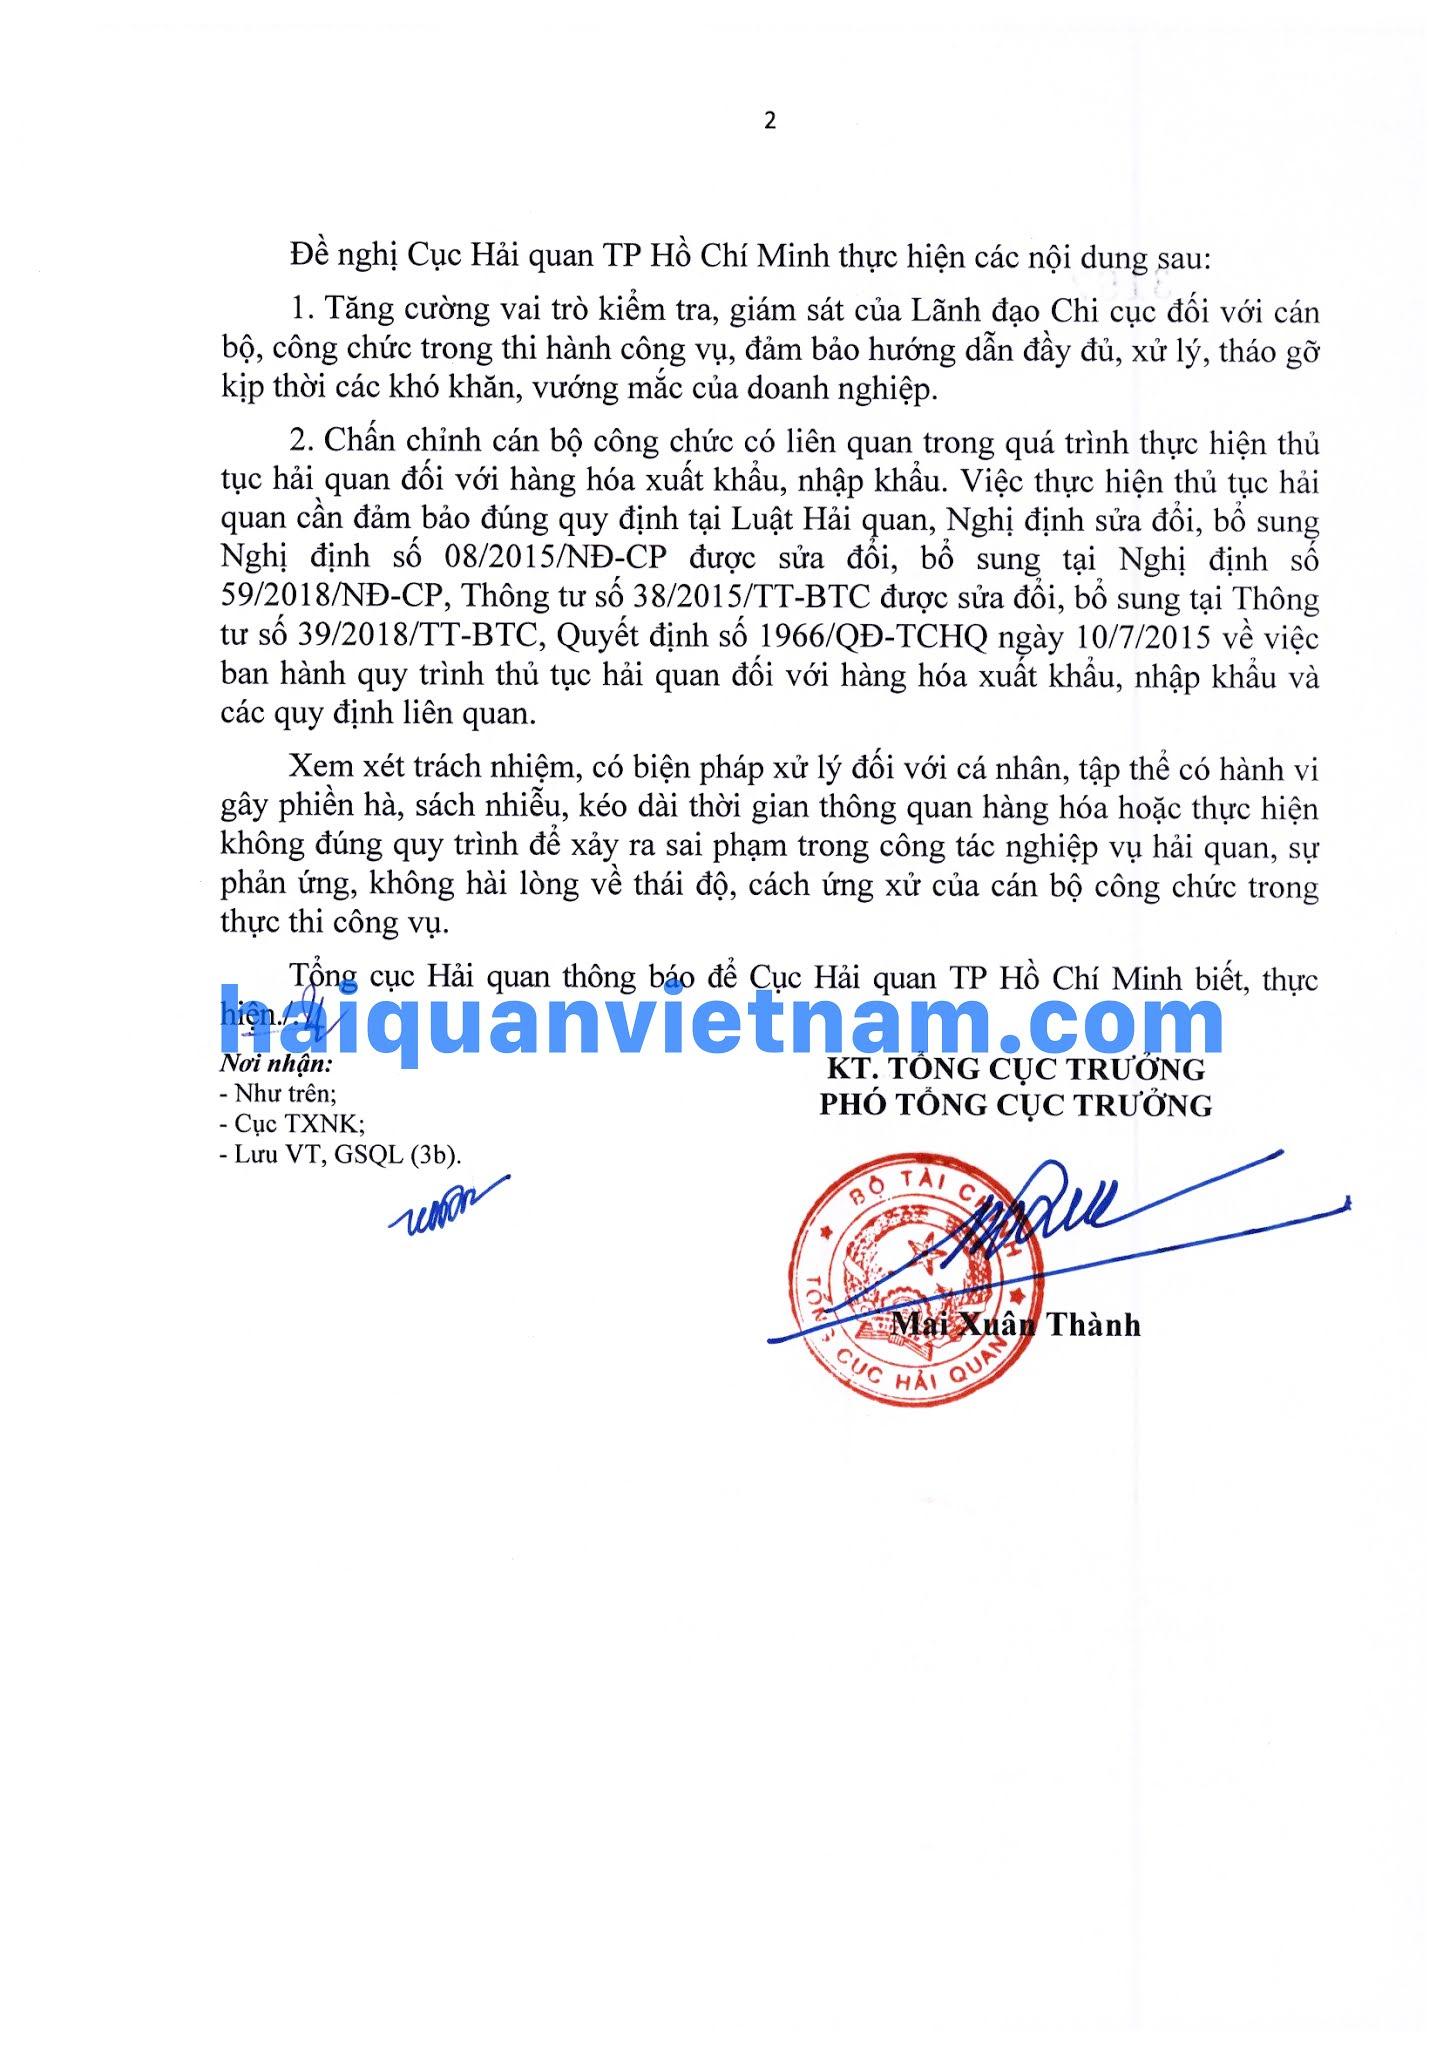 [Image: 210623_3167_TCHQ-GSQL_haiquanvietnam_02.jpg]